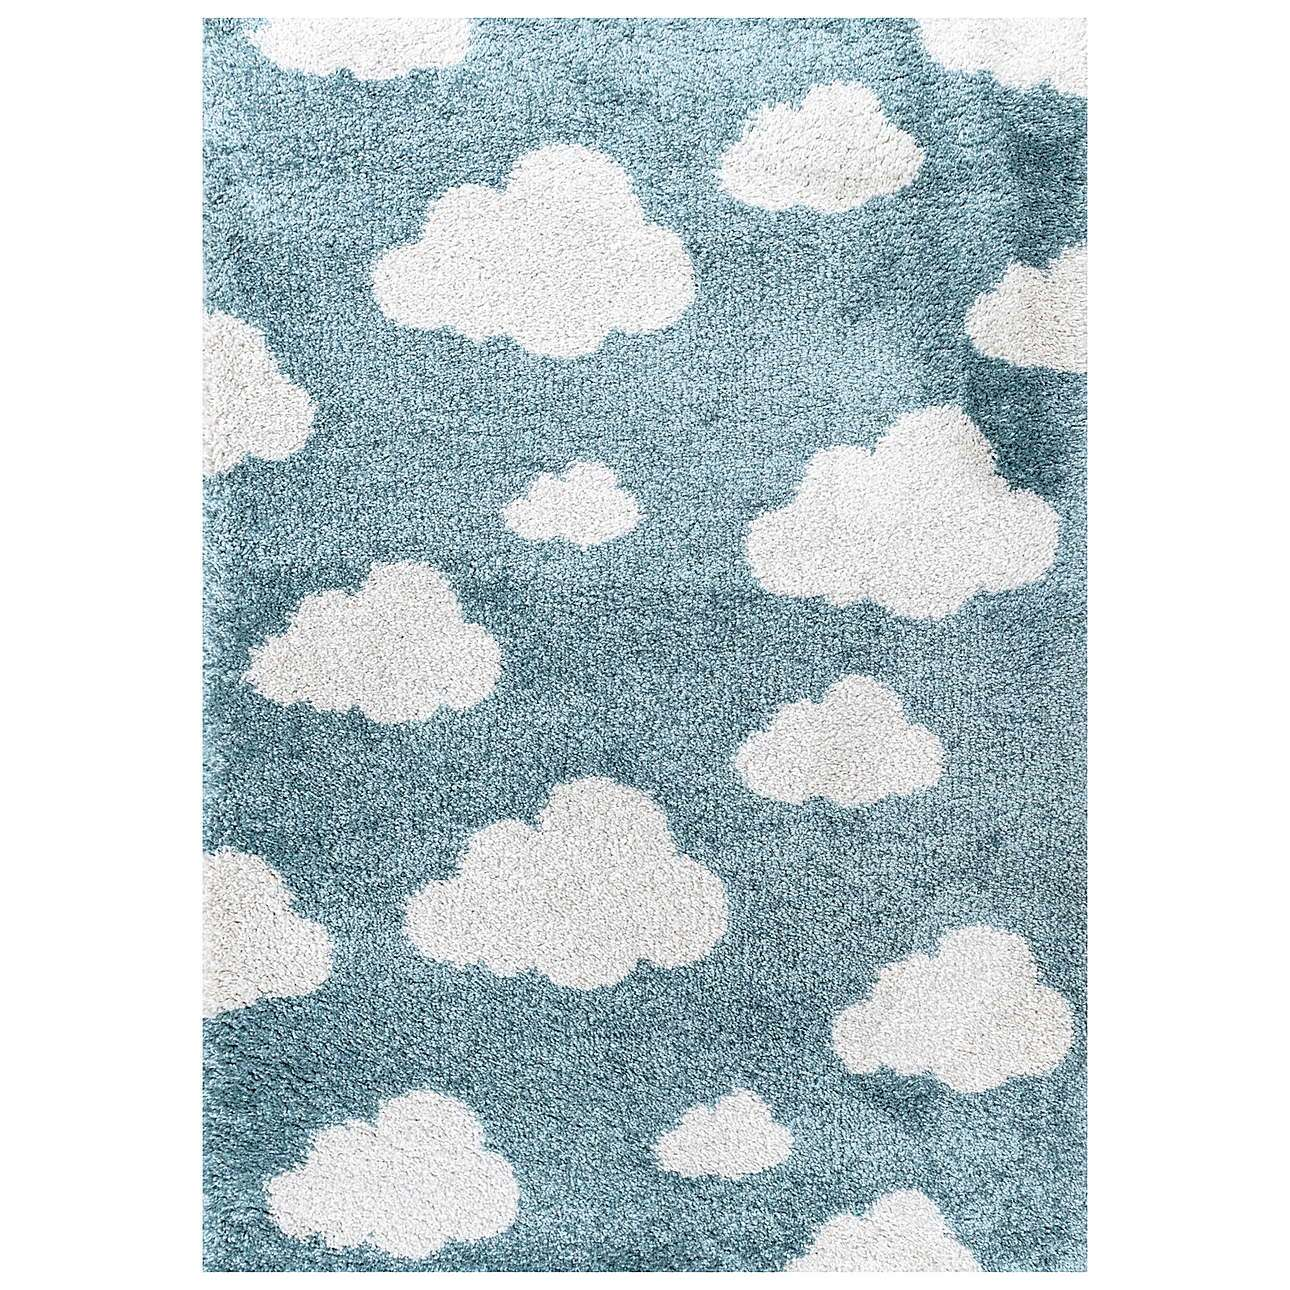 Clouds kilimas 160x230cm